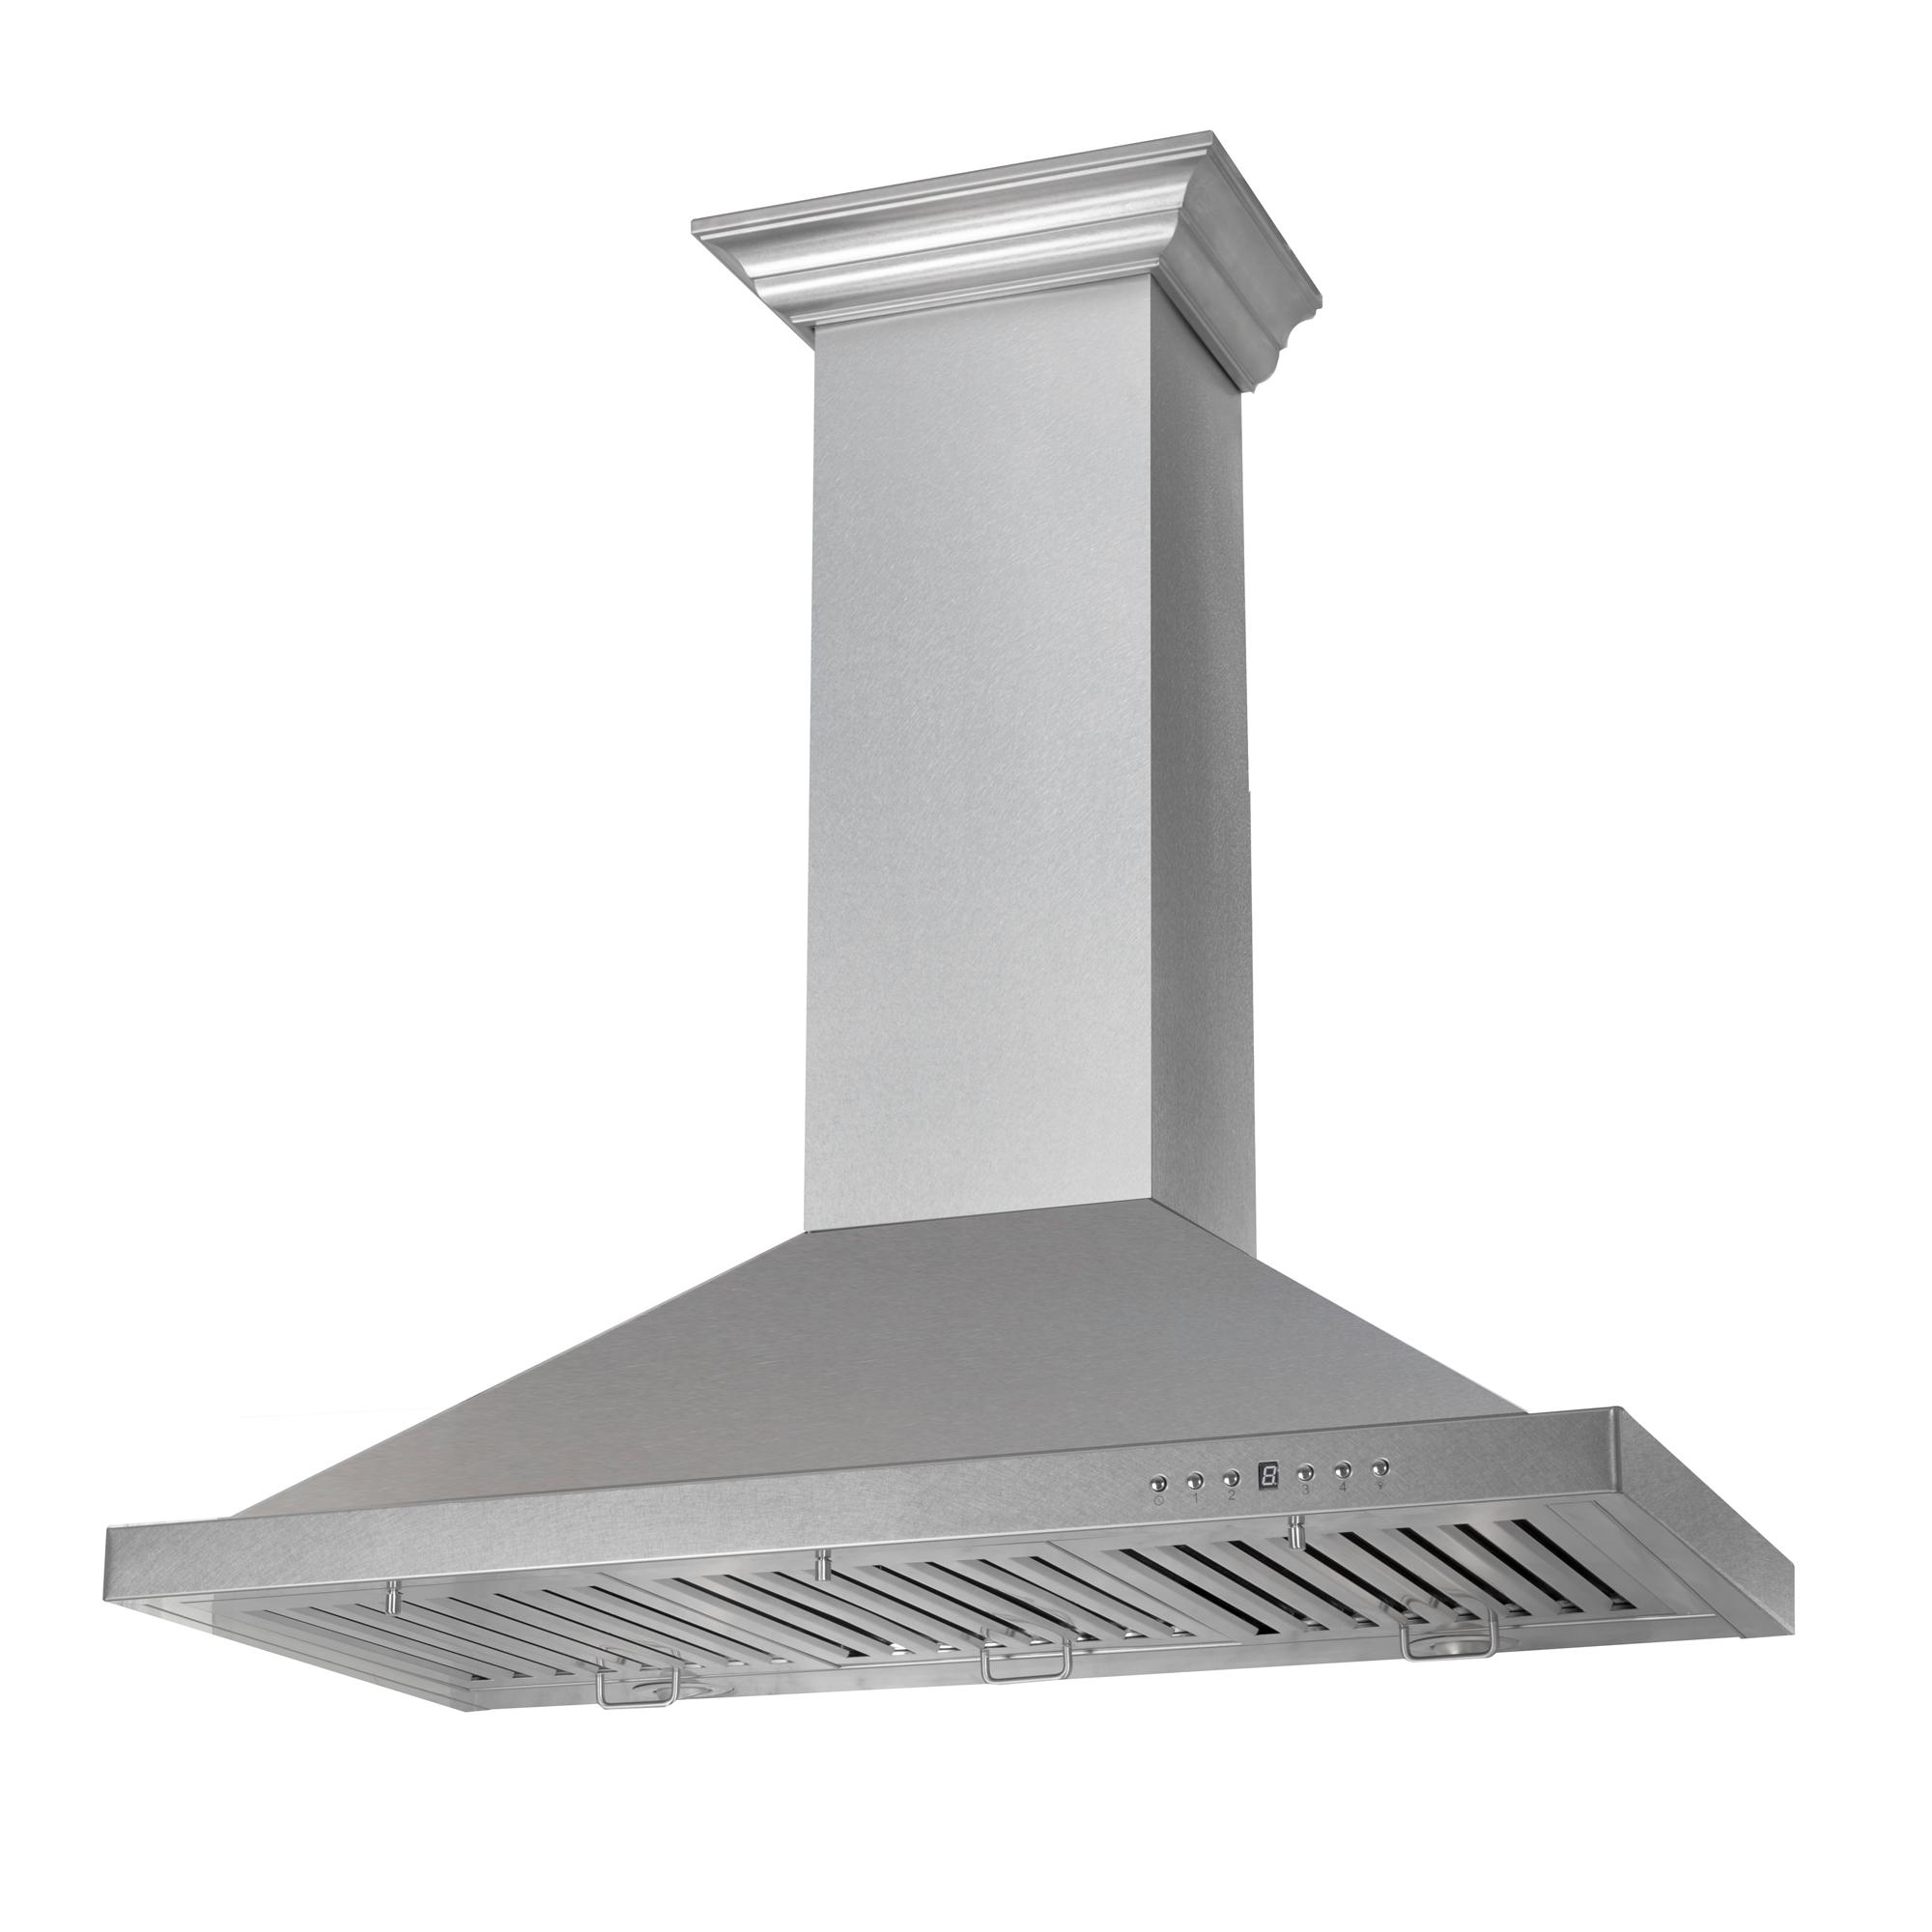 zline-snow-stainless-steel-wall-mounted-range-hood-8KBS-main.jpg